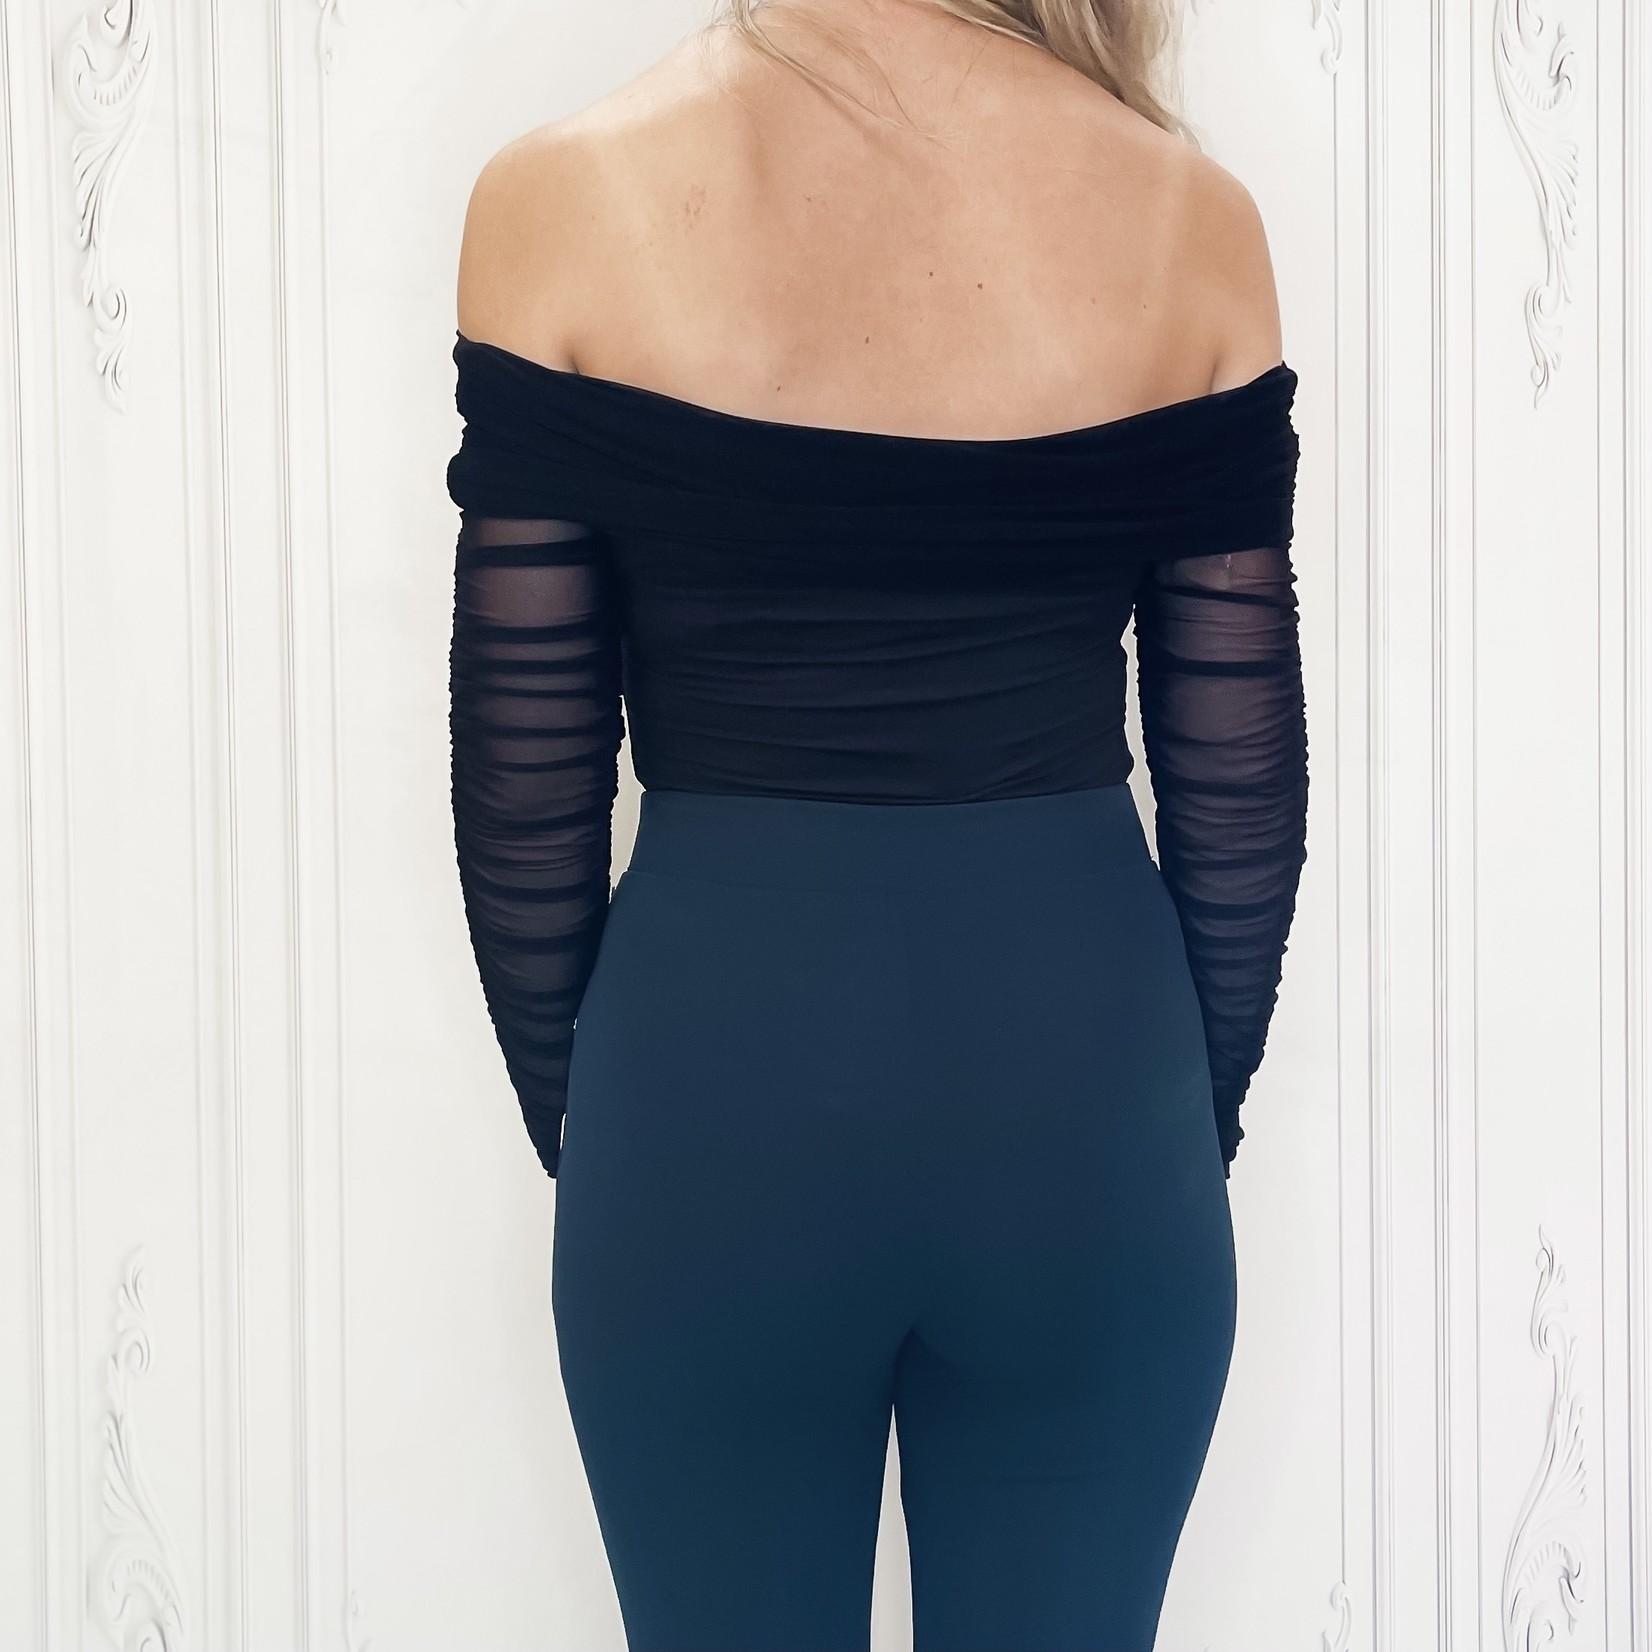 Illia mesh off shoulder bodysuit